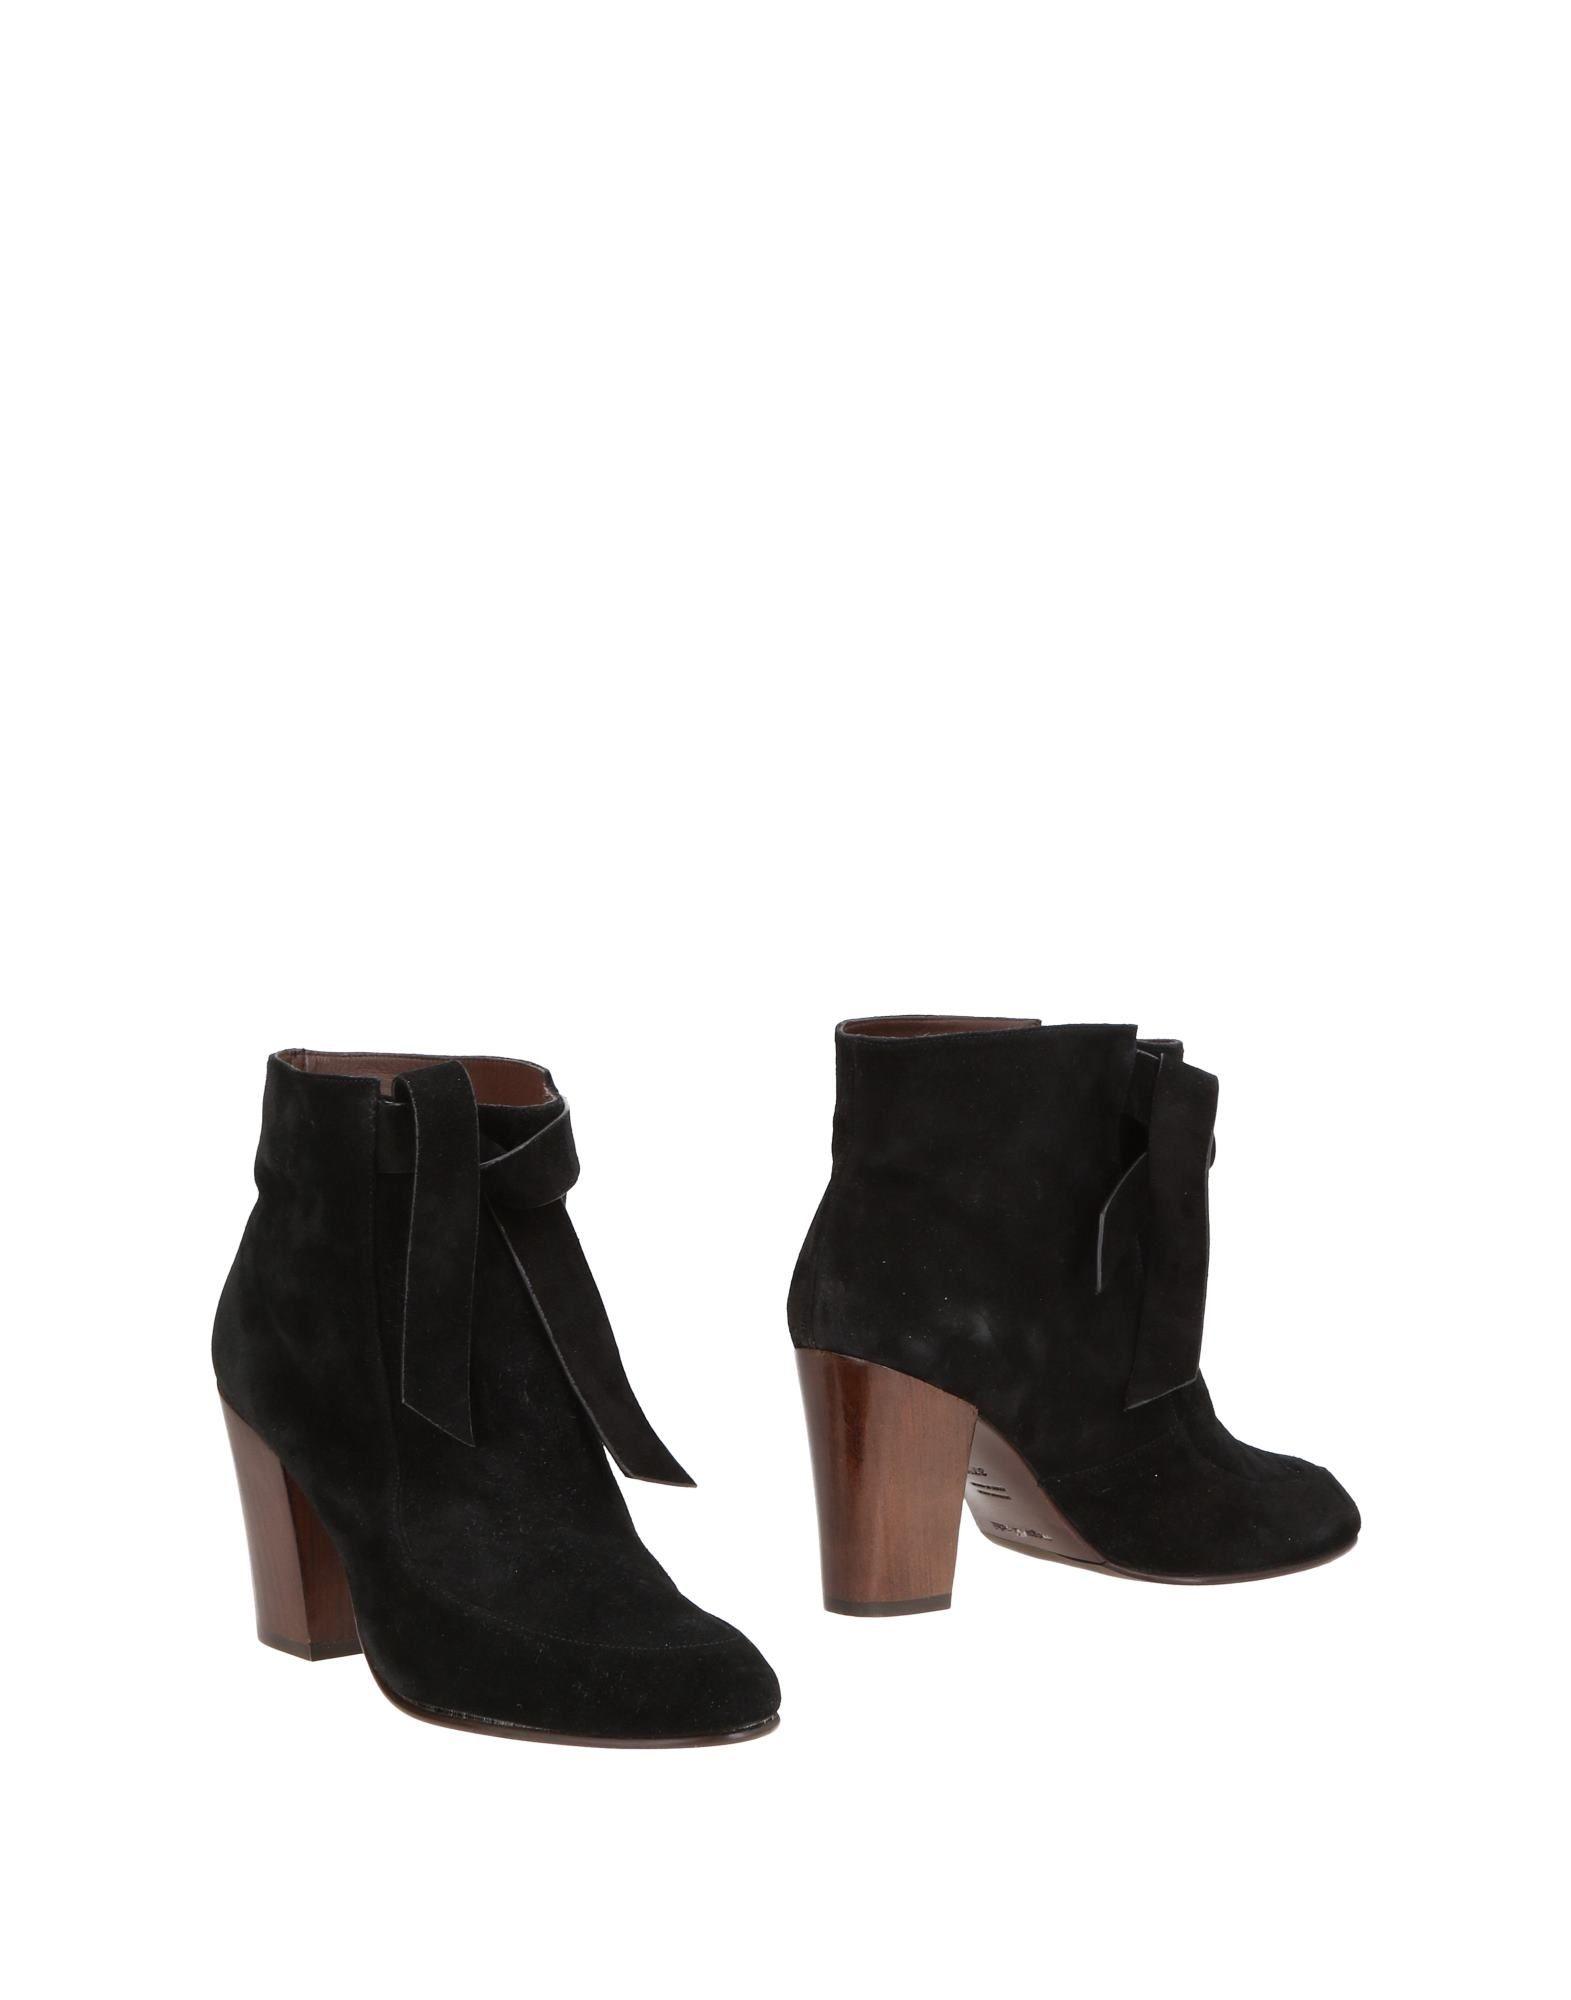 Stilvolle billige Schuhe Damen Megumi Ochi Stiefelette Damen Schuhe  11497169DQ 217123